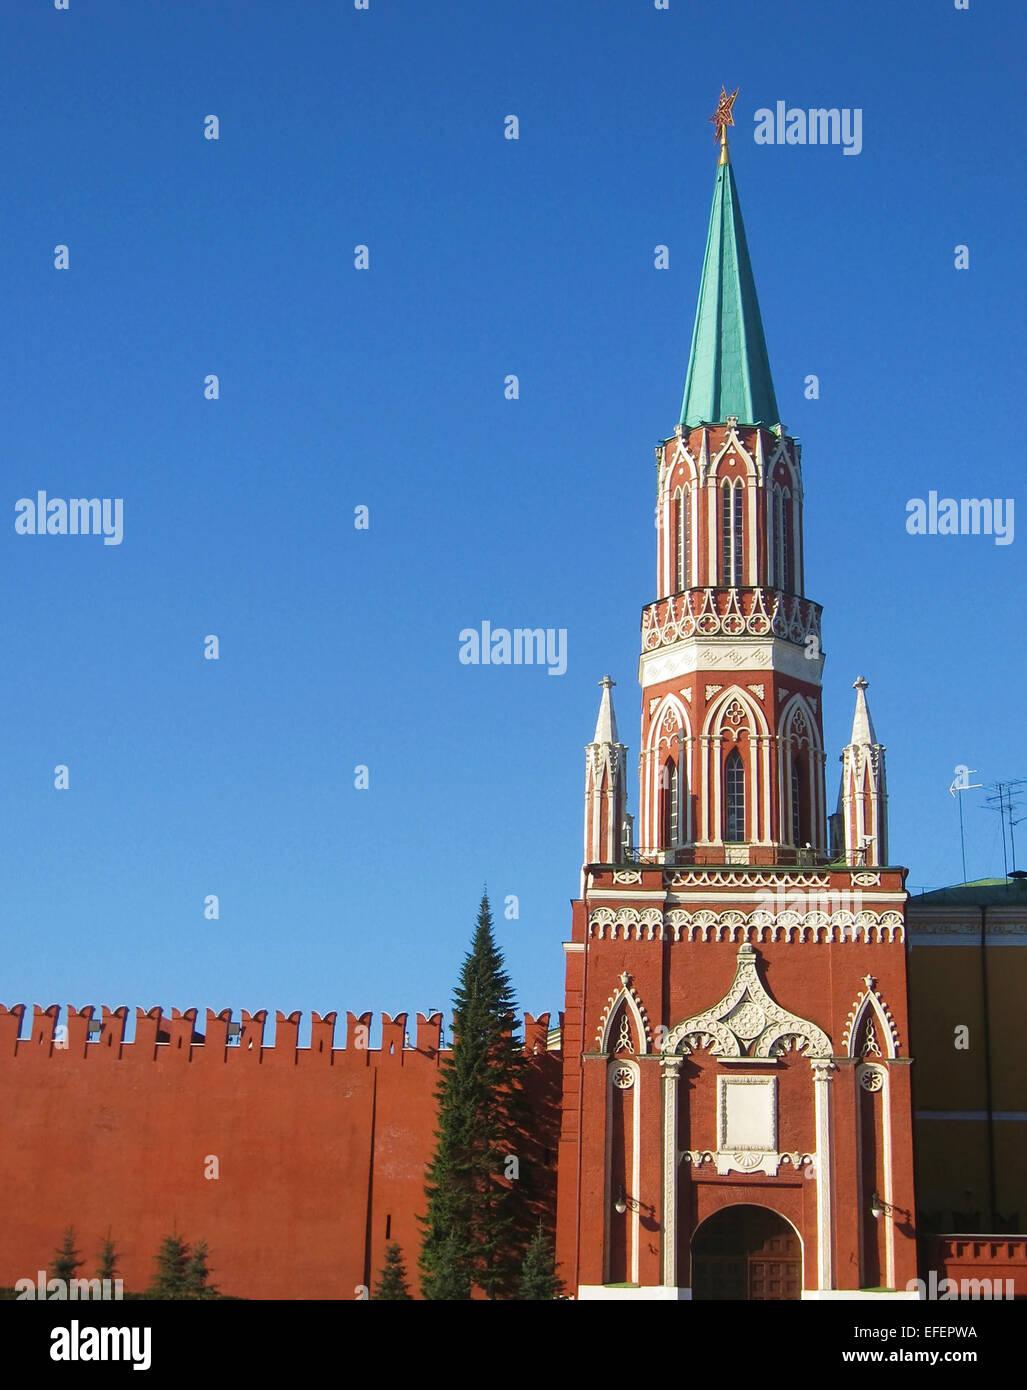 Moscow, Nikolskaya tower of Kremlin fortress. Date of recording 27.04.2008. - Stock Image